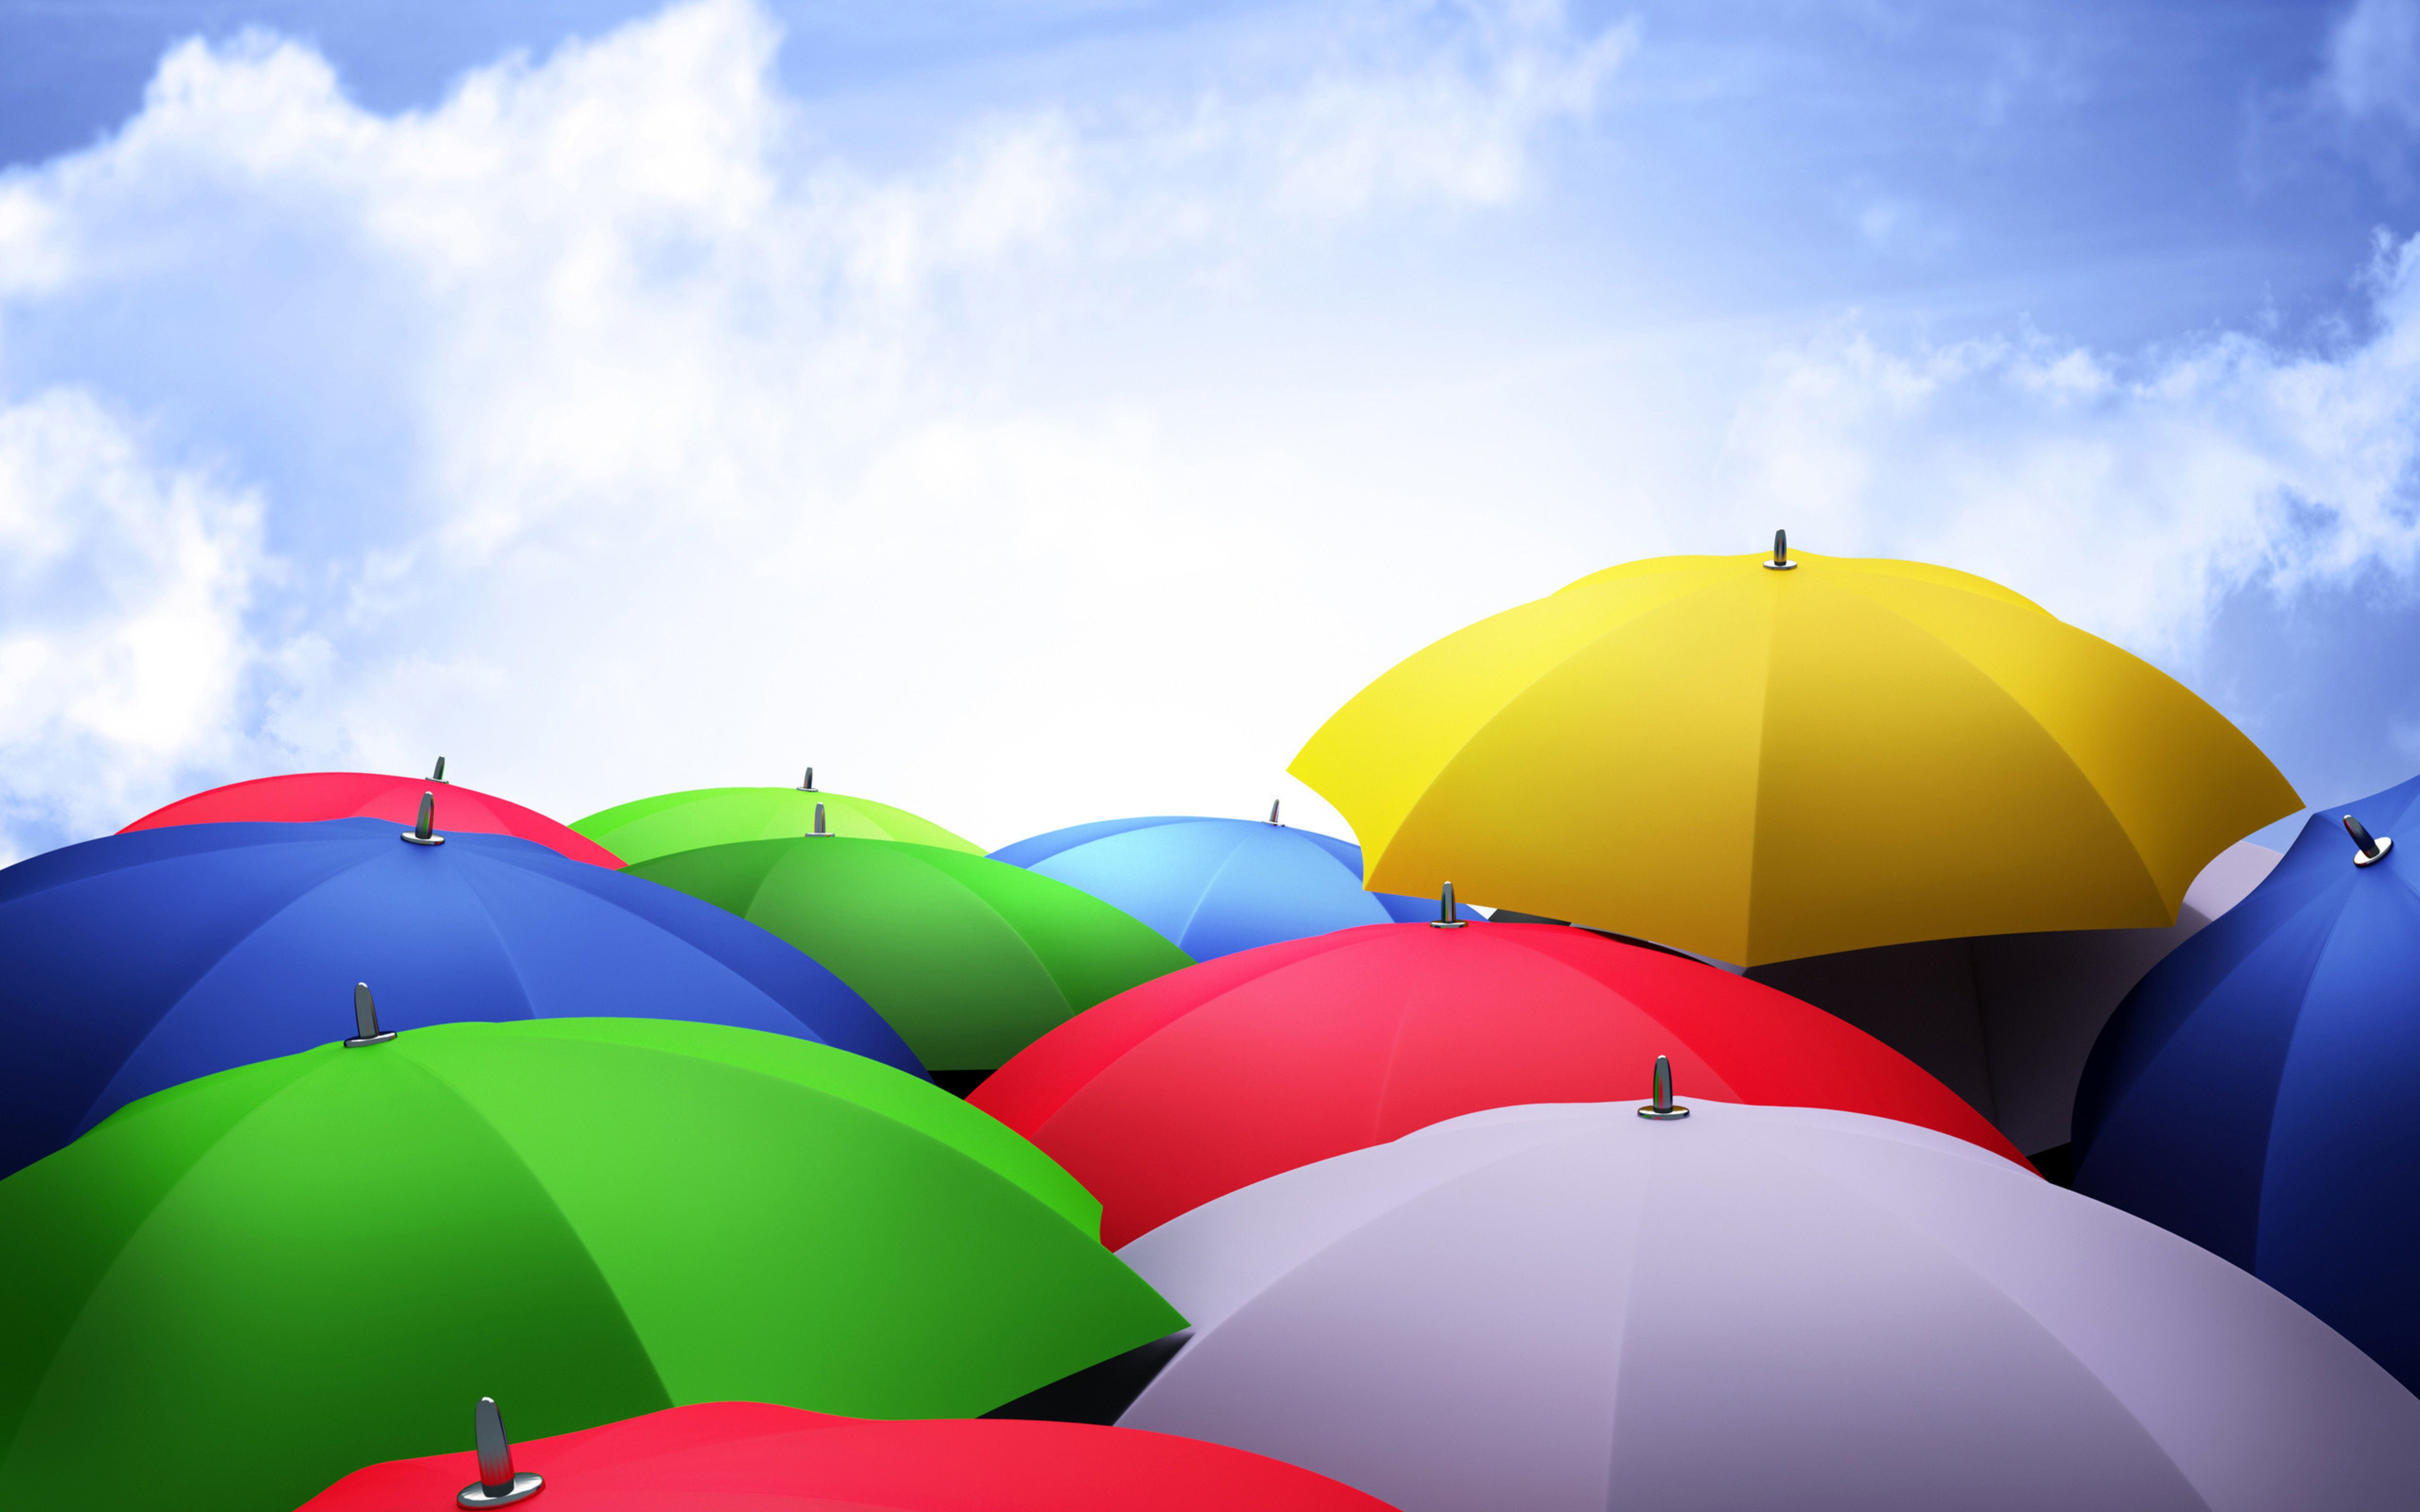 Durability Comapct Umbrella From Susino Colorful Umbrellas Umbrella Backgrounds Desktop